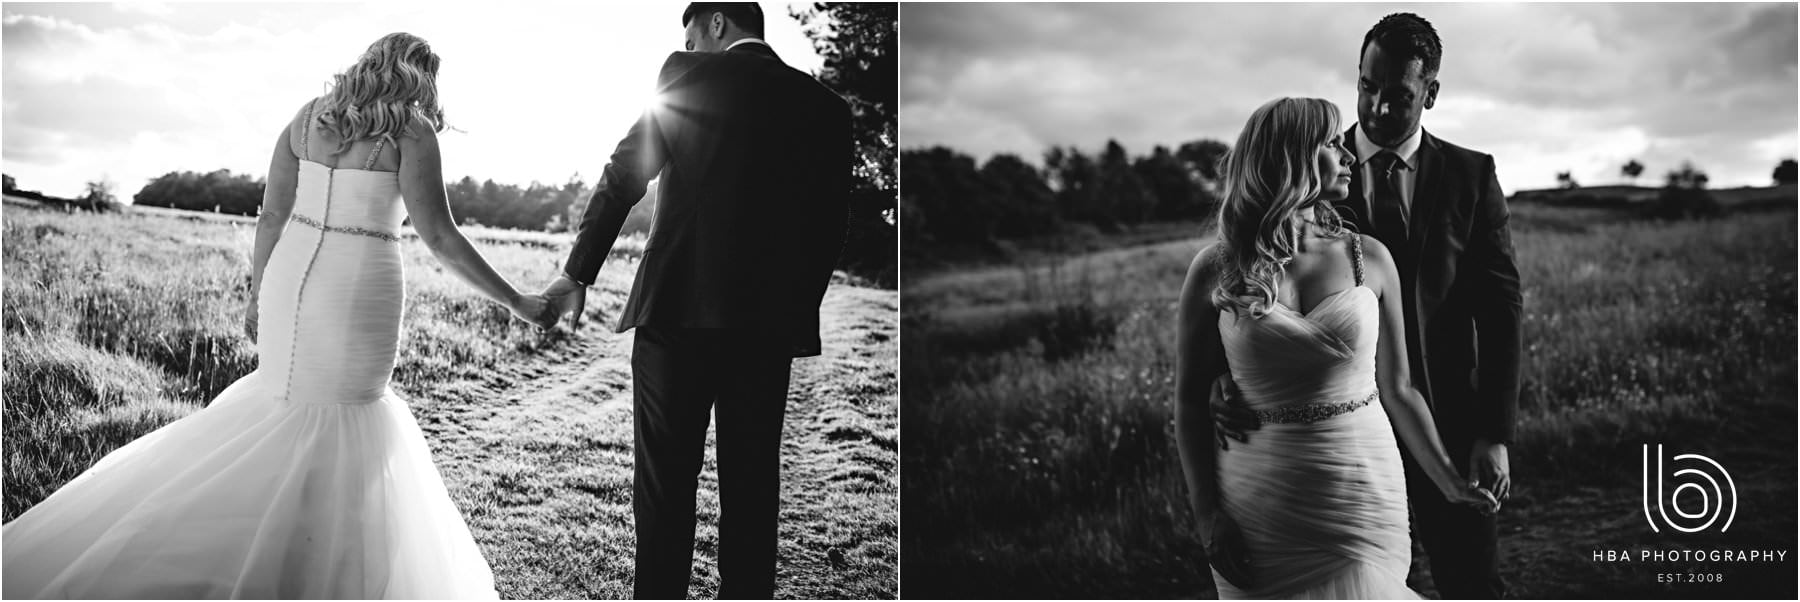 The bride & groom walking in the field